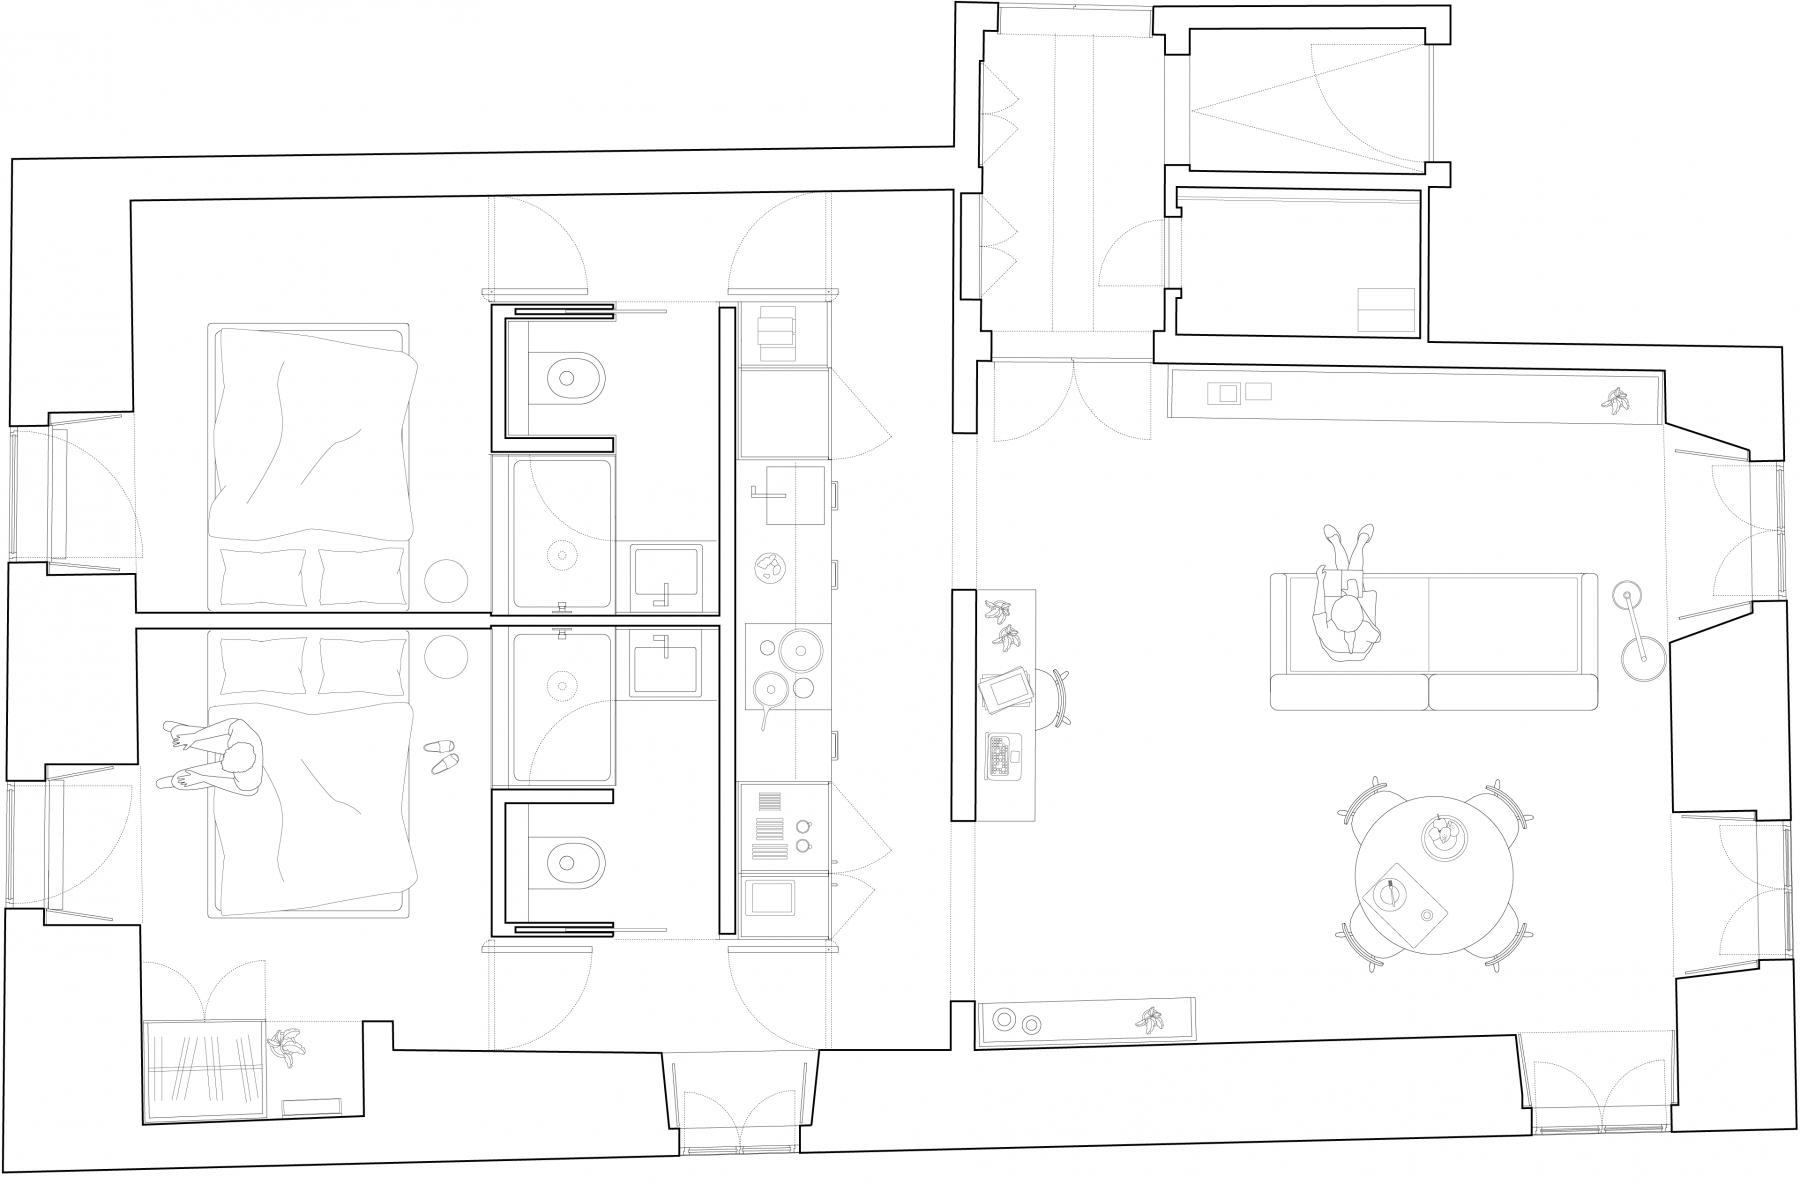 dc ad academia das ciencias architecture plan